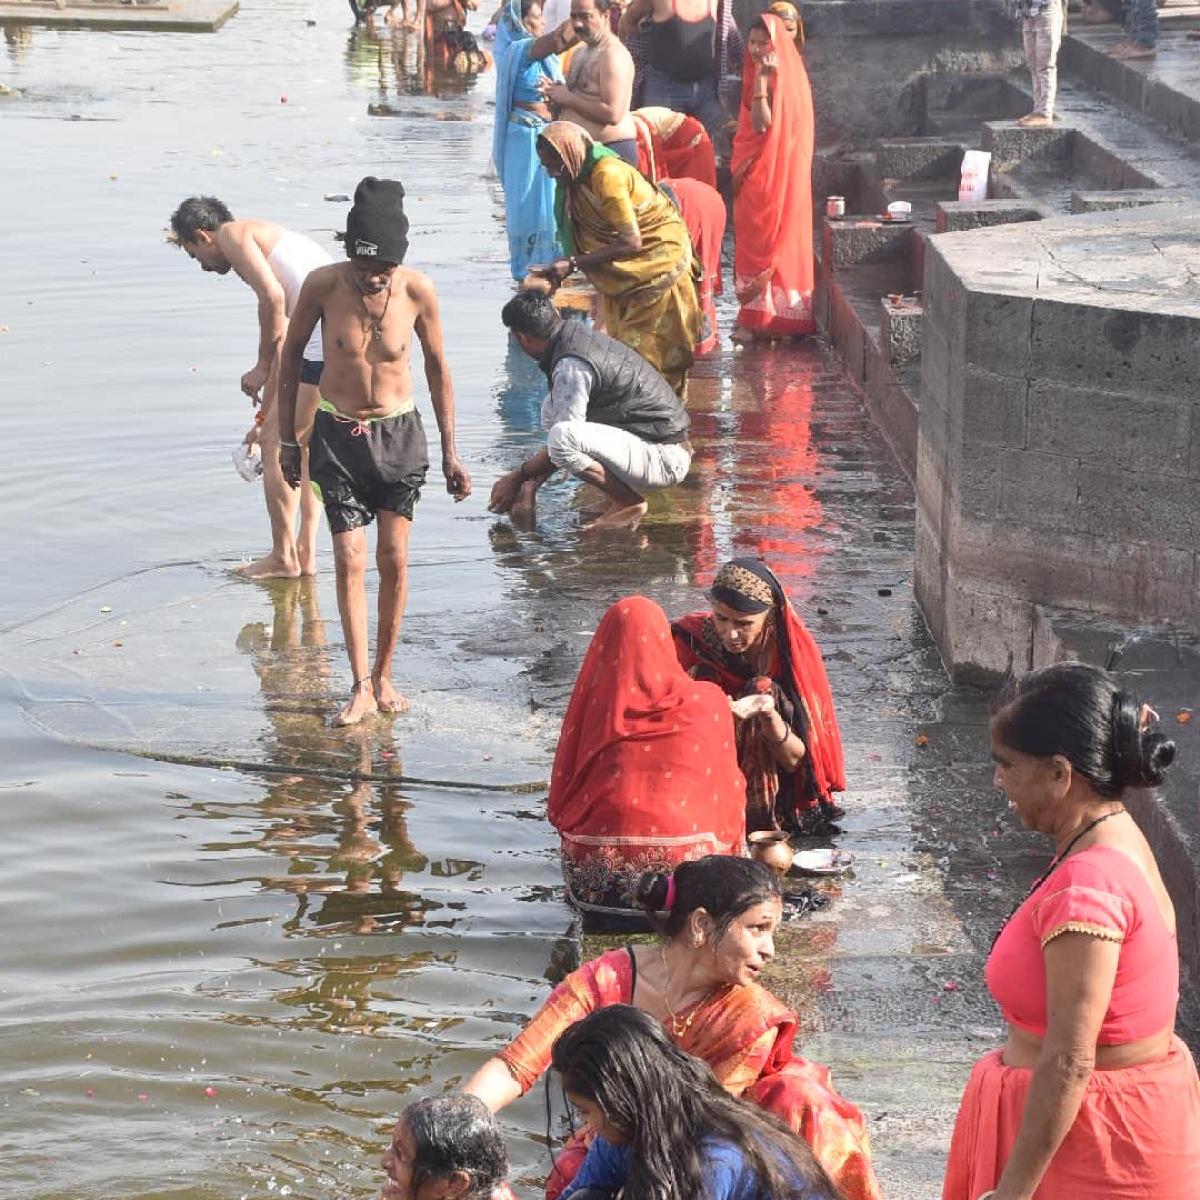 Ujjain: Silt hassles devotees at Kshipra ghats